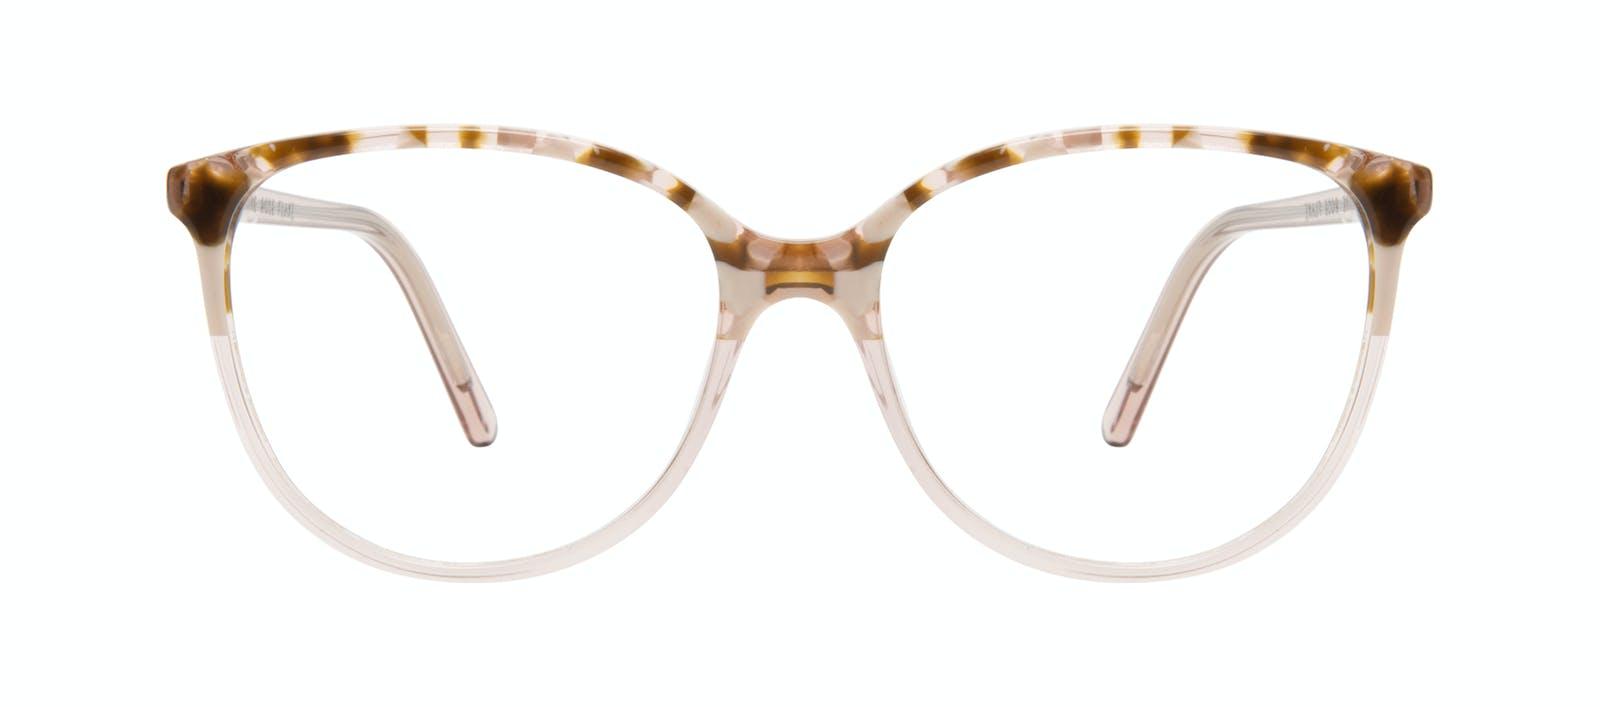 8709f9e951 Affordable Fashion Glasses Round Eyeglasses Women Imagine Rose Flake Front